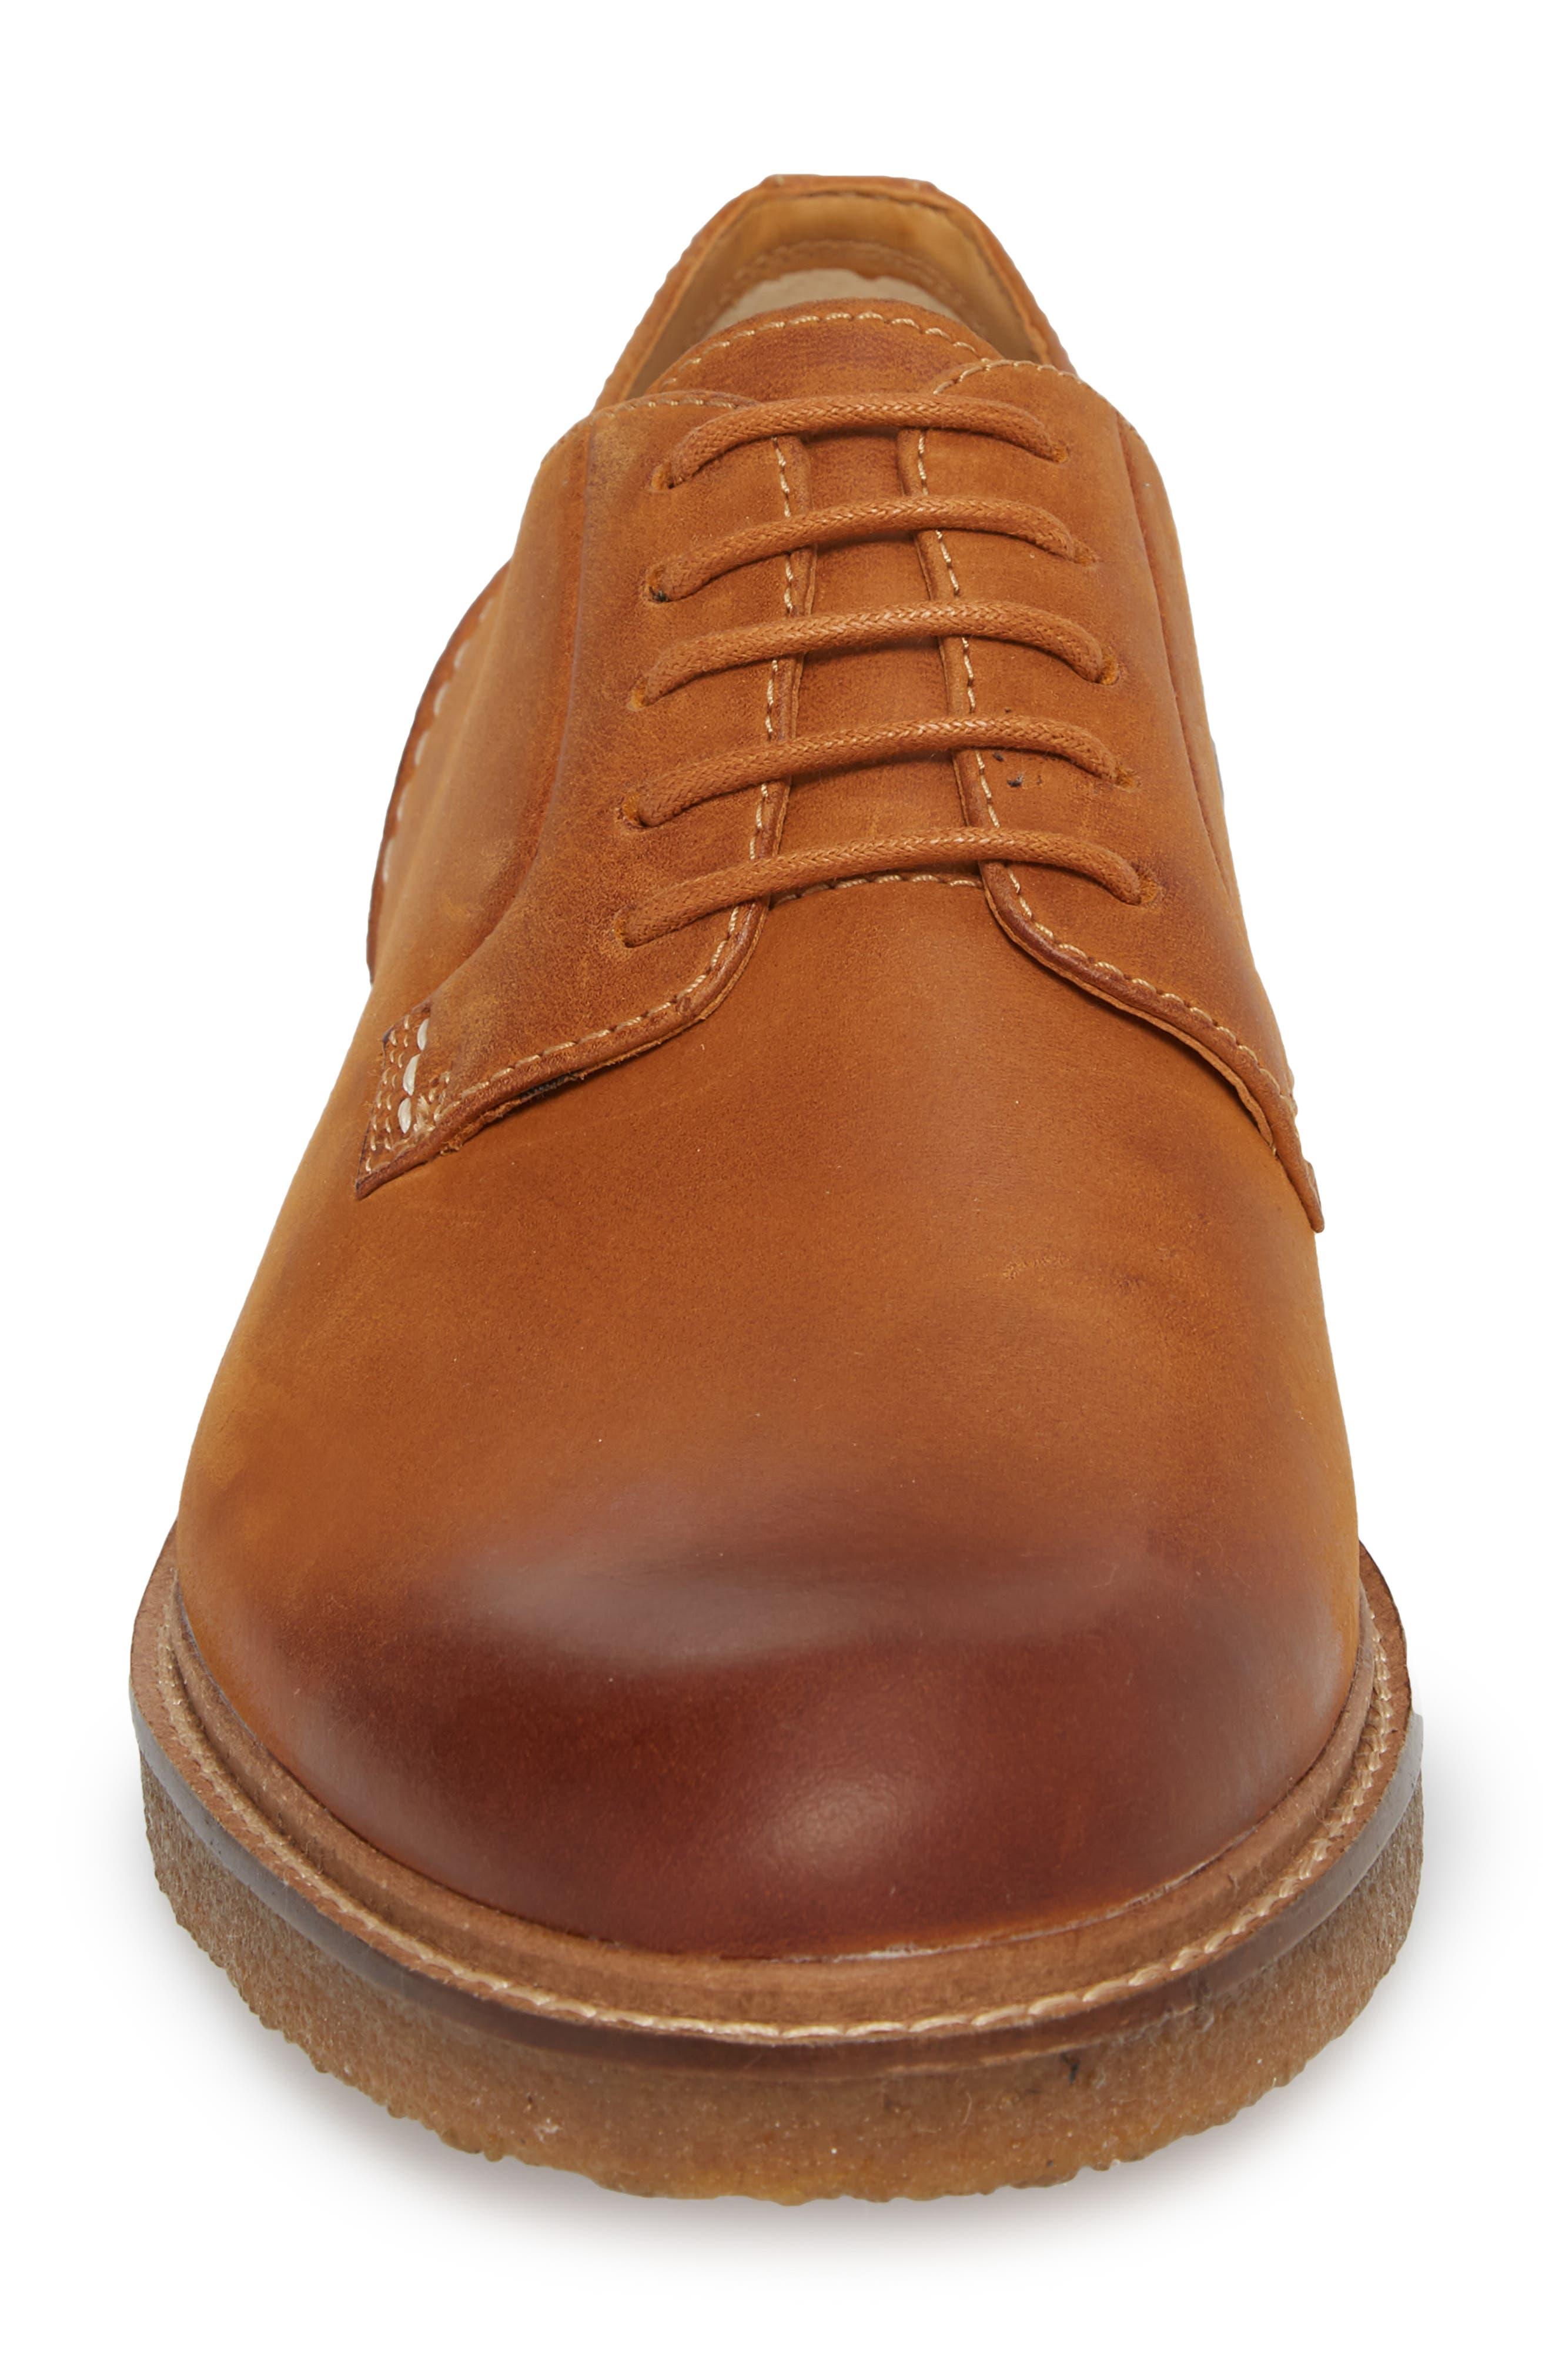 Gold Cup Plain Toe Derby,                             Alternate thumbnail 4, color,                             Tan Leather